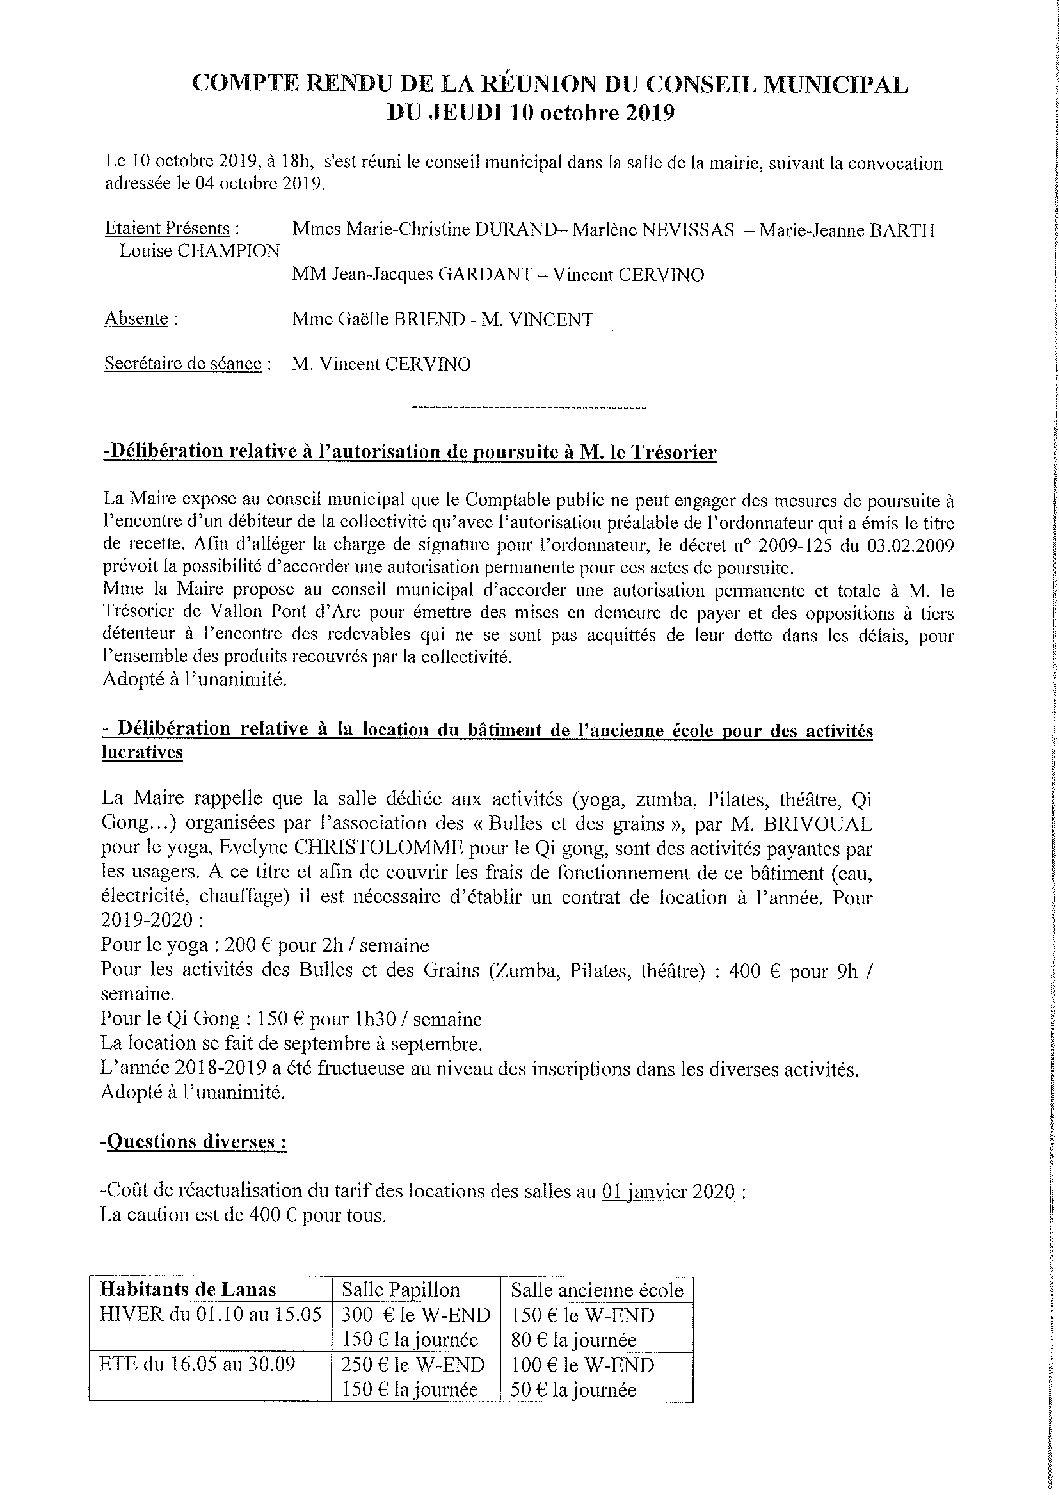 CR du Conseil municipal du 10.10.2019